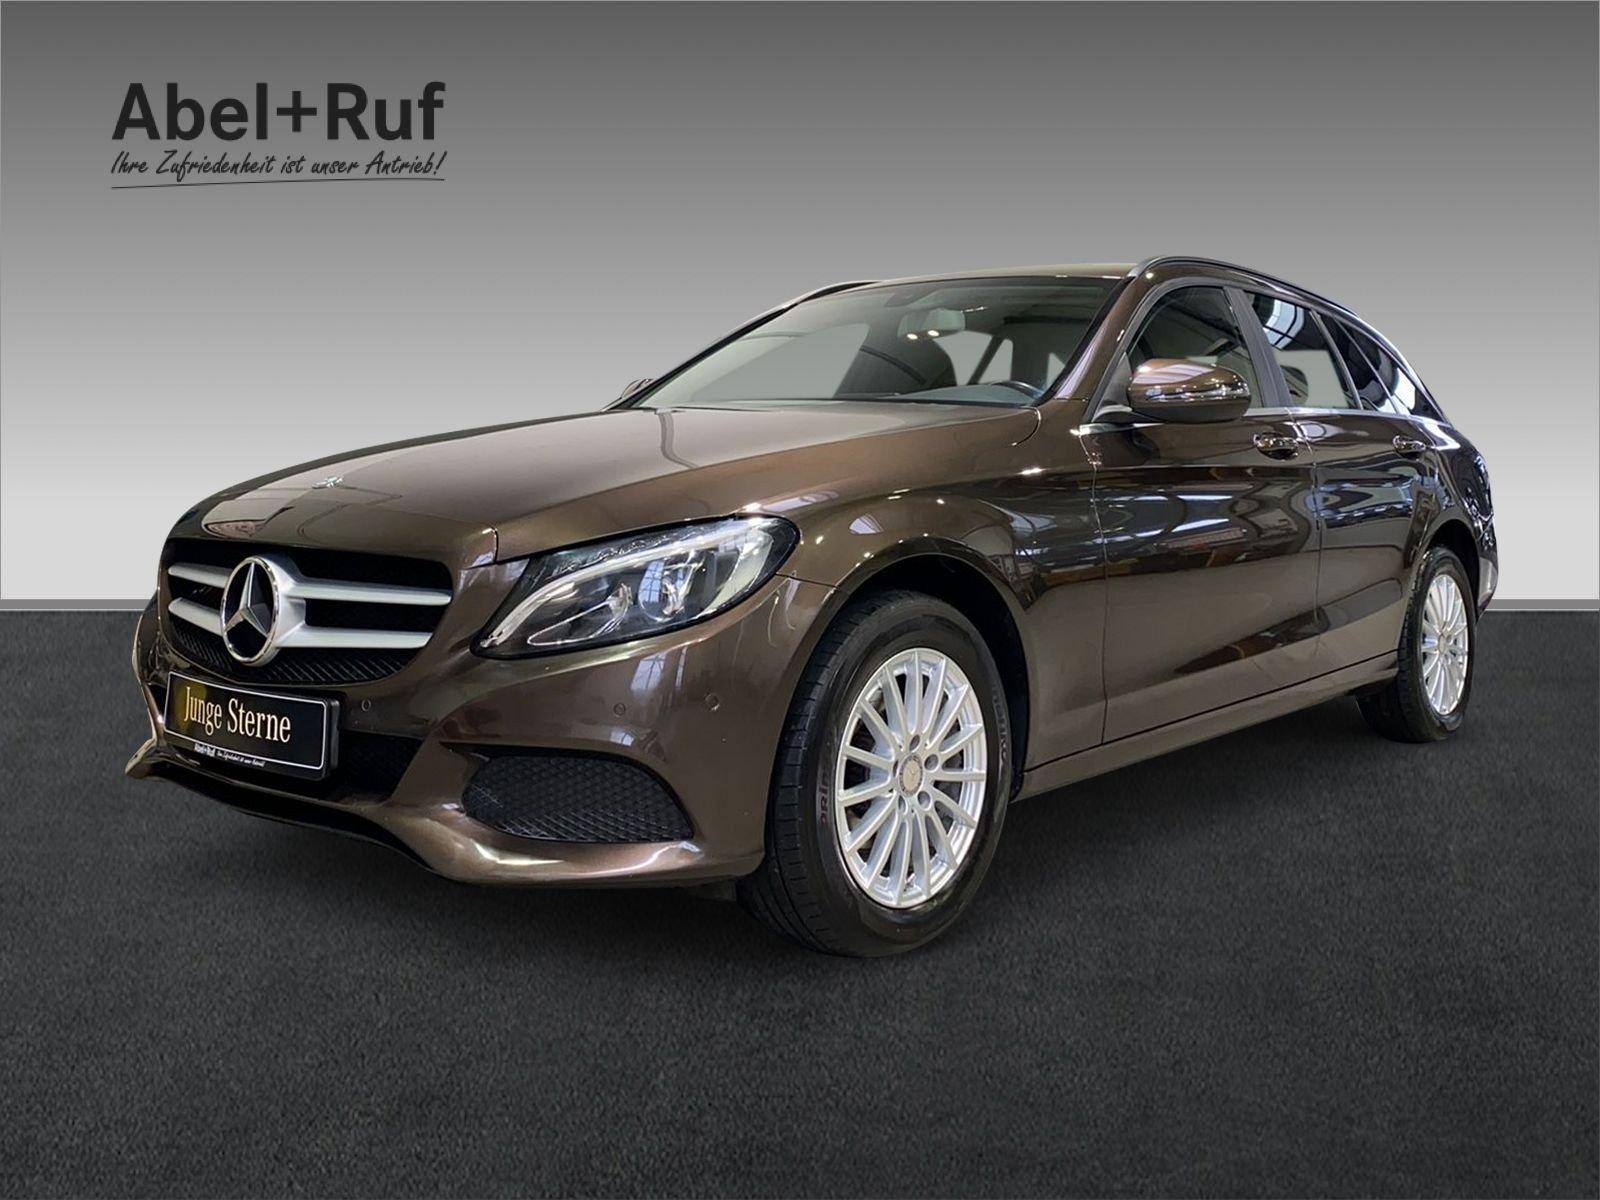 Mercedes-Benz C 200 d T Navigation+SHZ+Easy-Pack+LED High Perf, Jahr 2015, Diesel